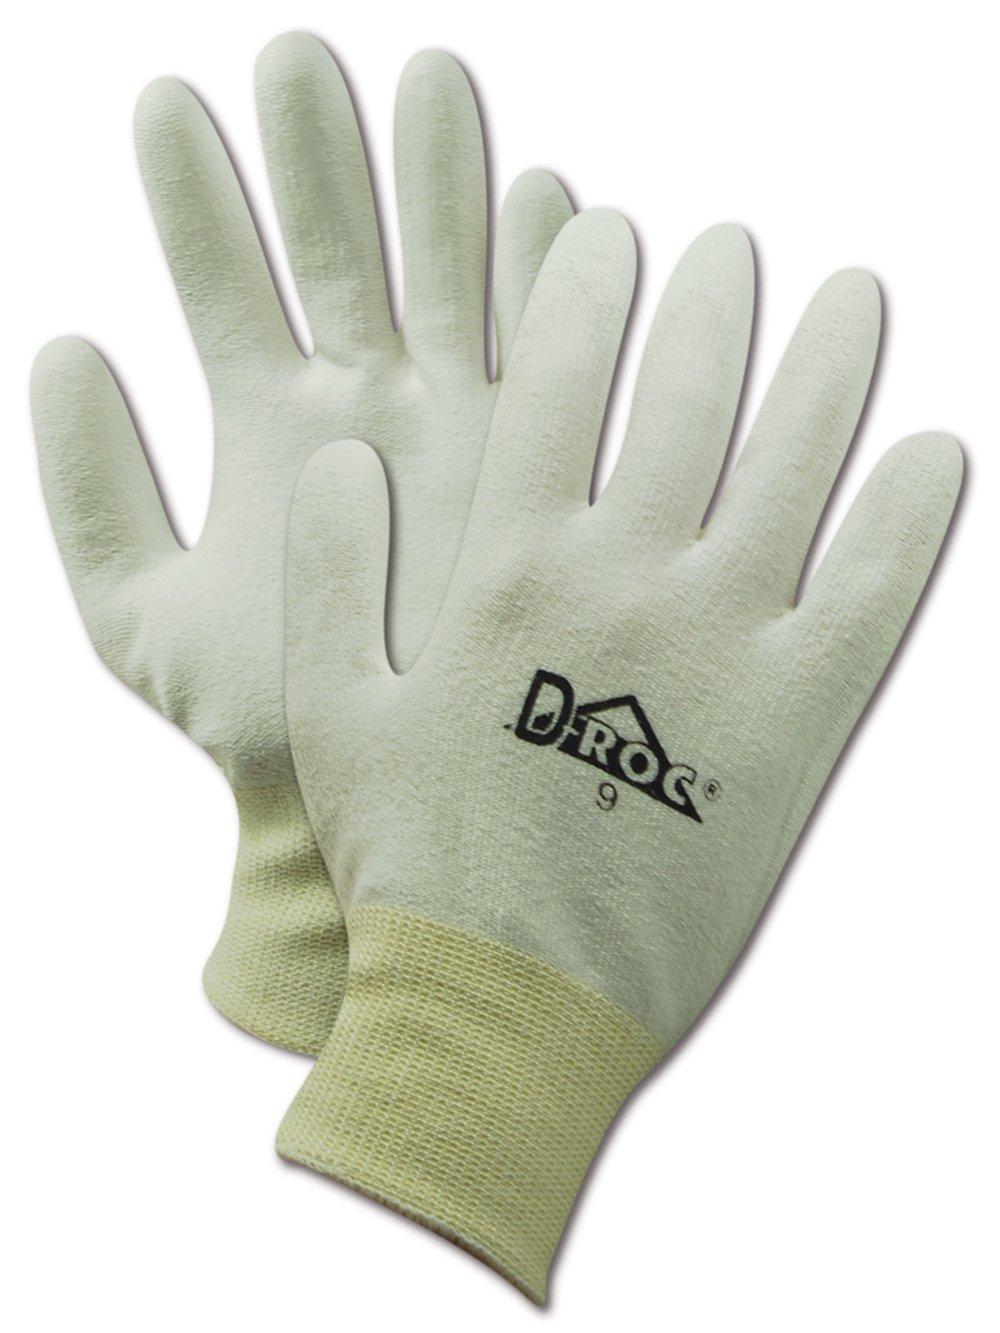 "Magid D-ROC PF540 Polyethylene/Polyester Glove, Polyurethane Palm Coating, Knit Wrist Cuff, 9"" Length, Size 8  (Pack of 1))"